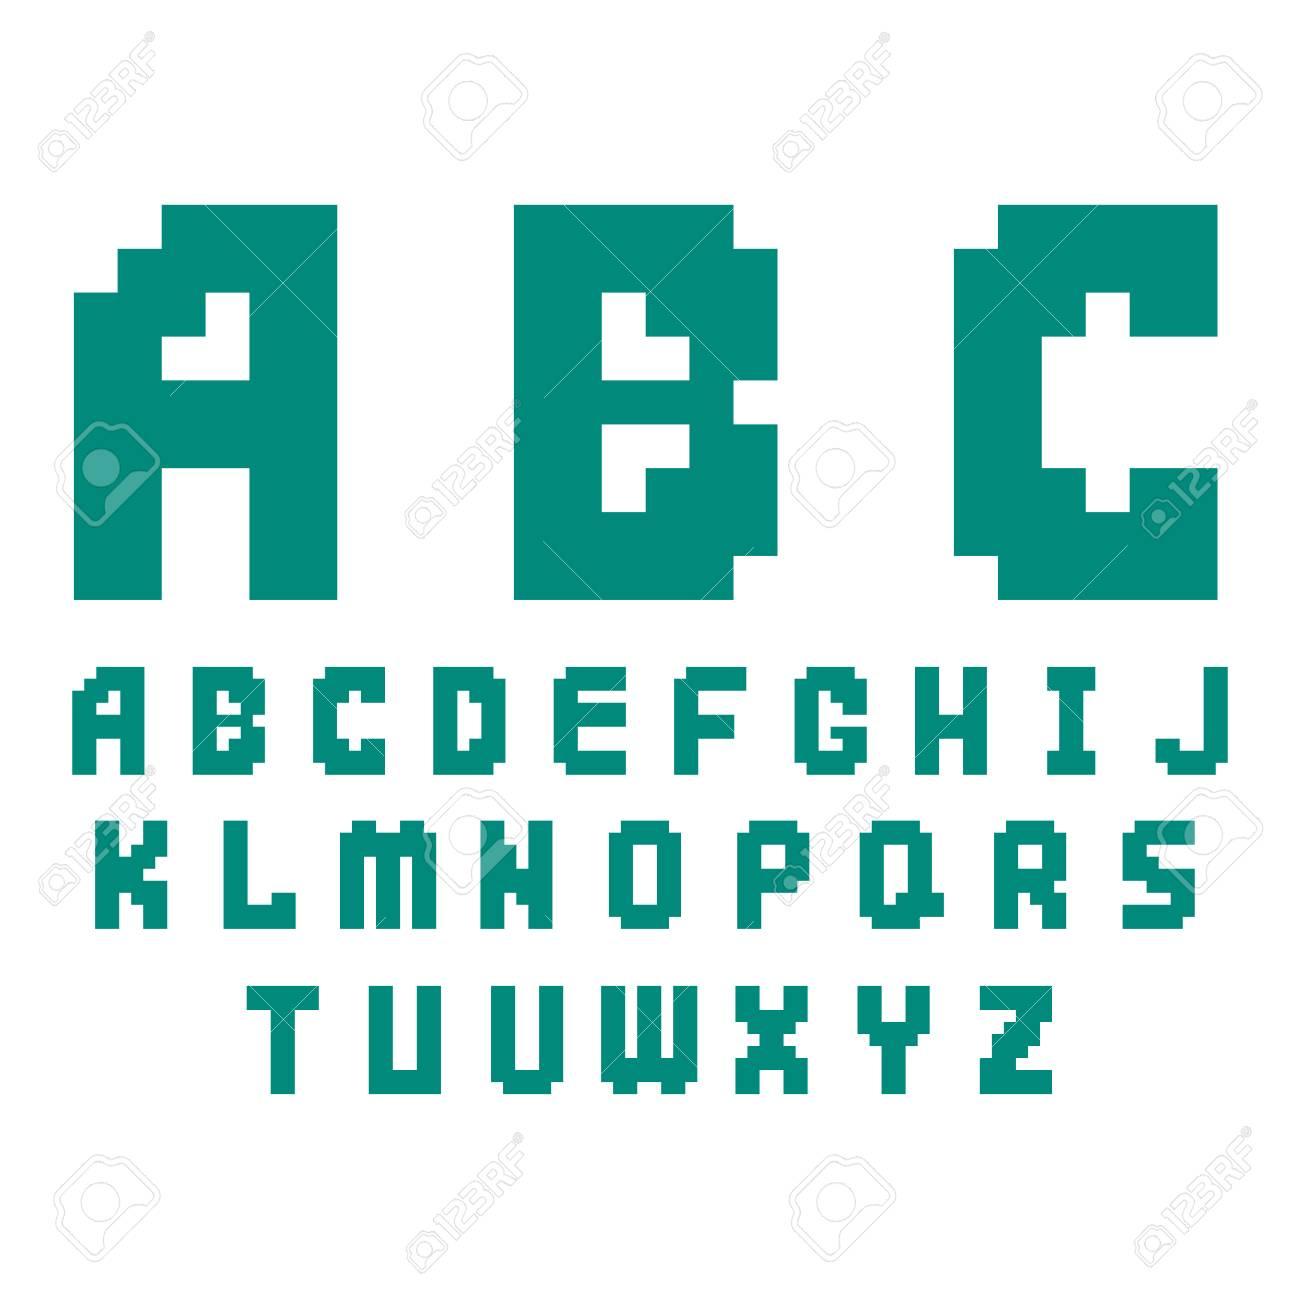 Pixel Retro Font Video Computer Game Design 8 Bit Letters Electronic.